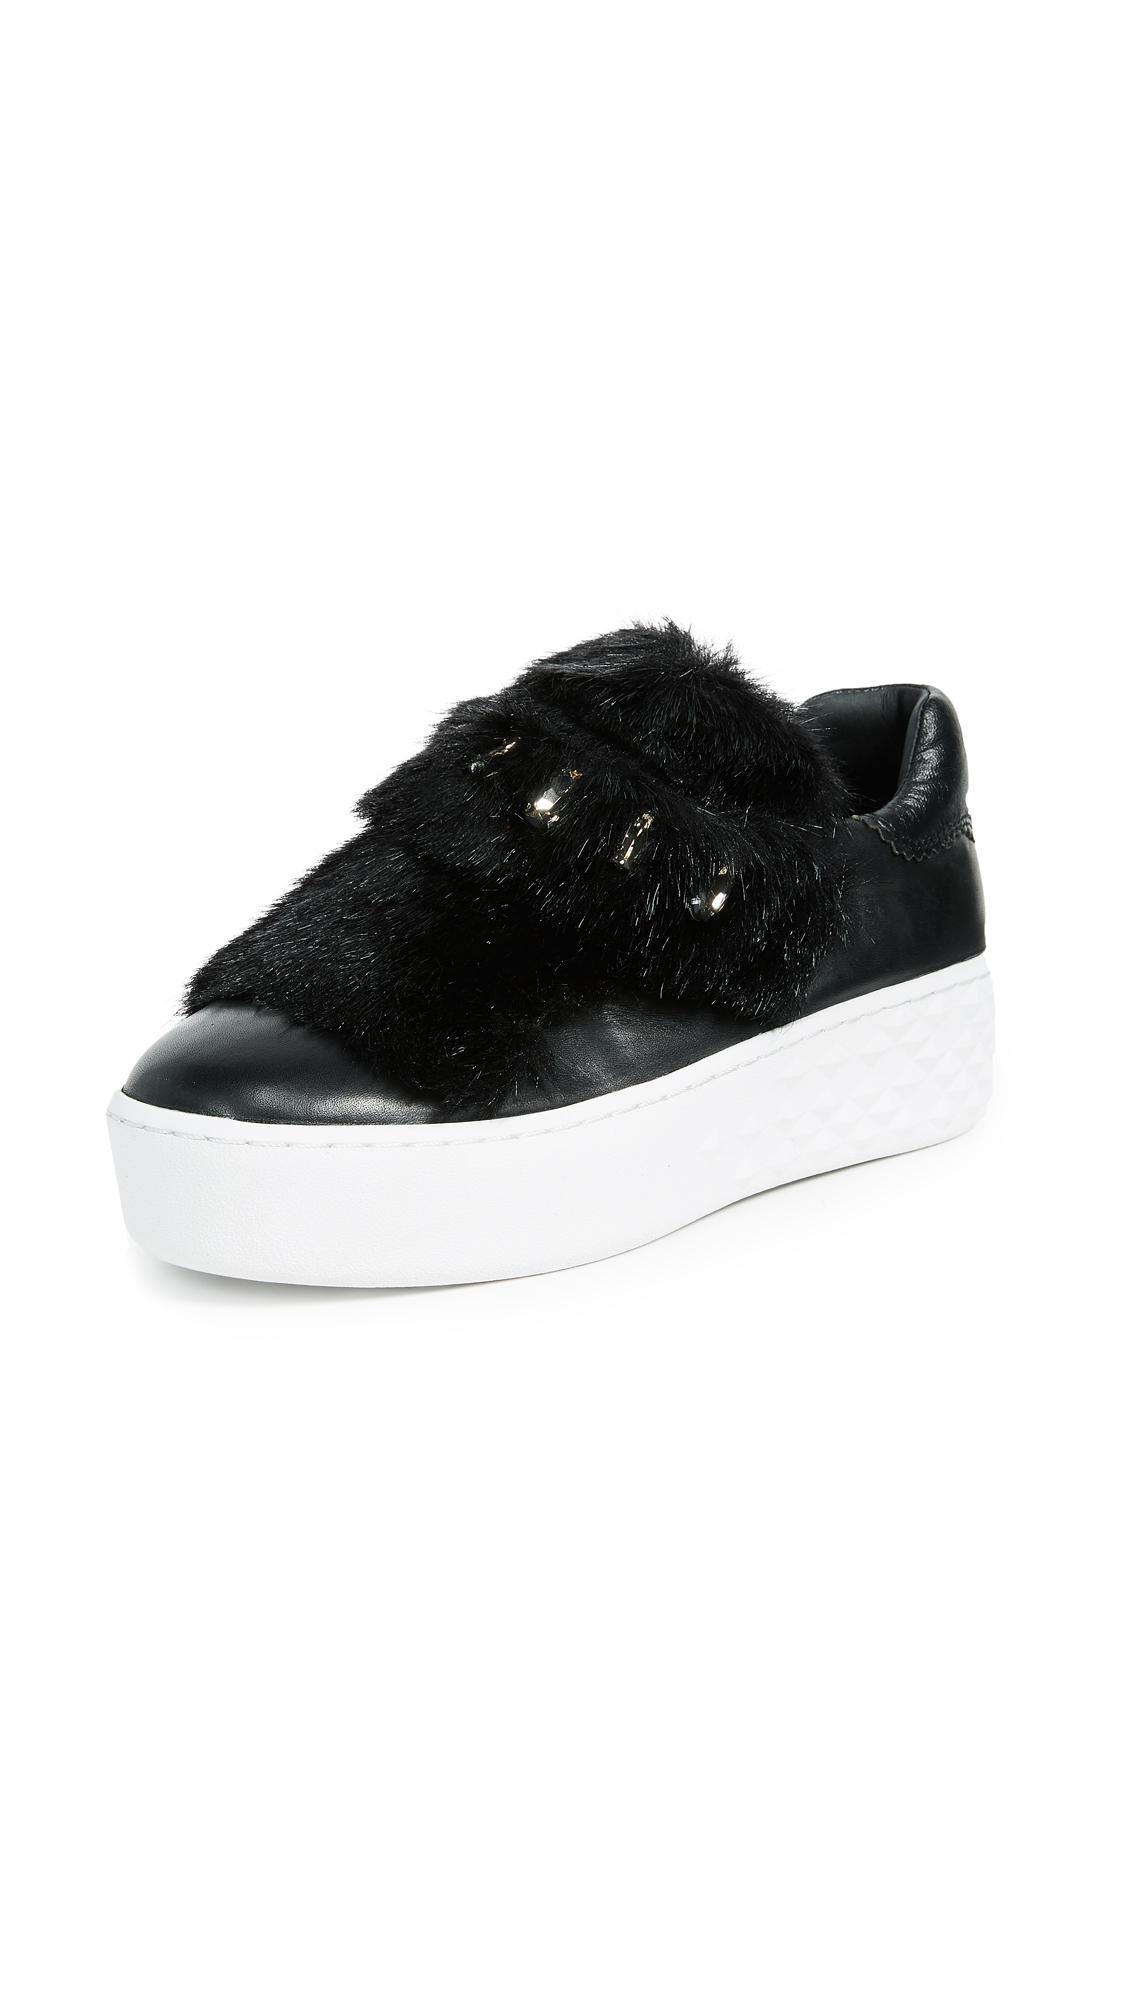 Ash Djin Platform Sneaker - Black/Black